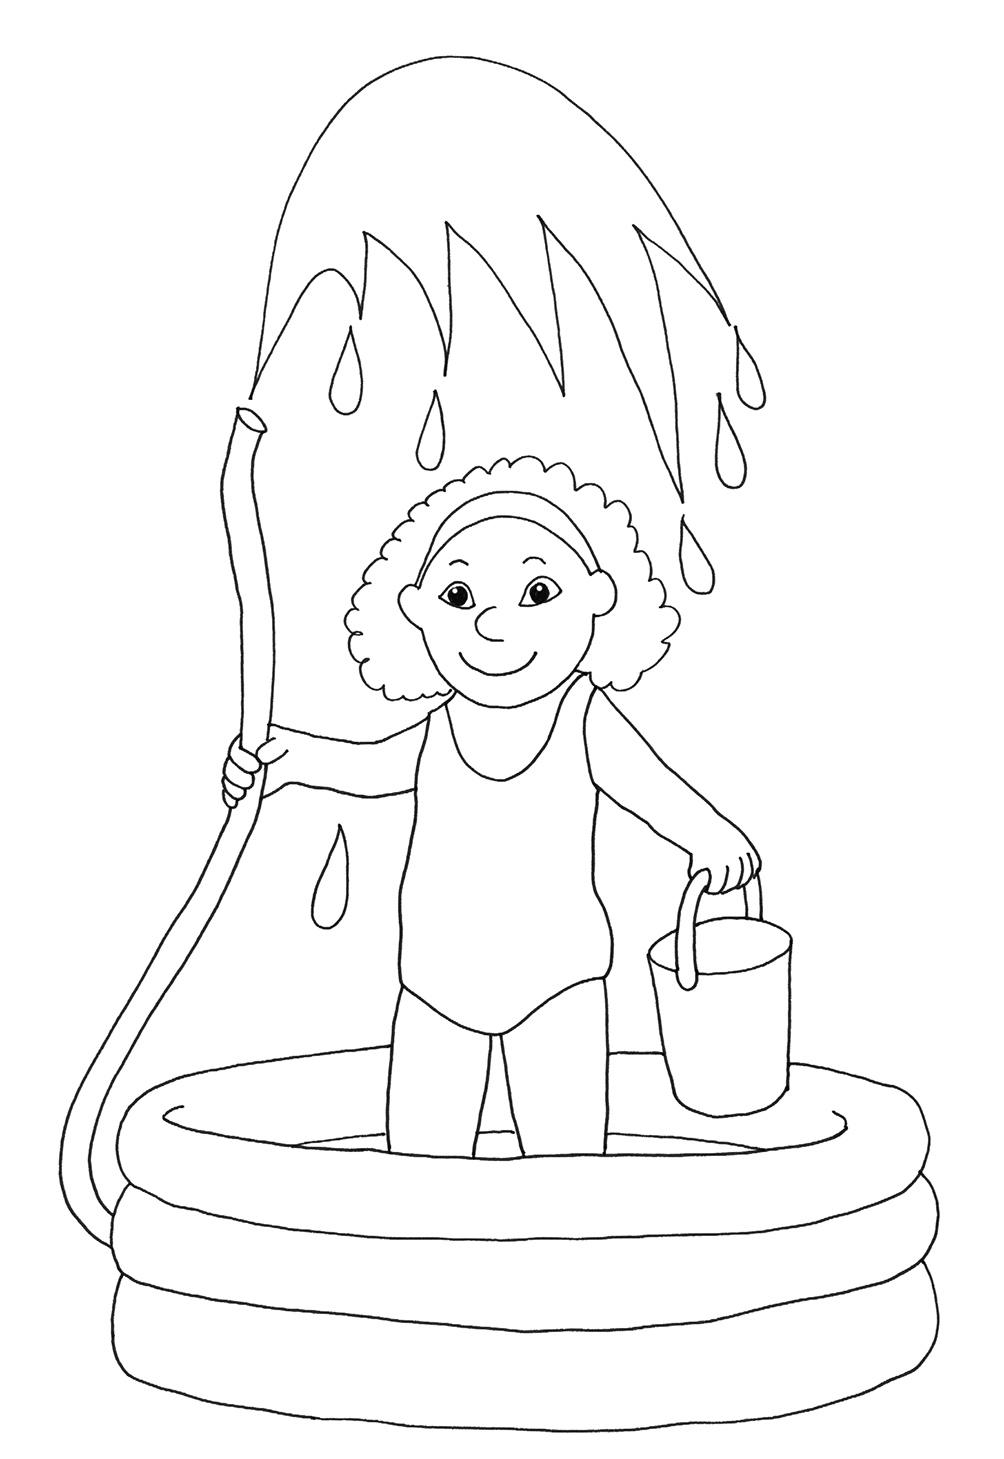 printable watercolor pages free printable digimon coloring pages for kids watercolor printable pages